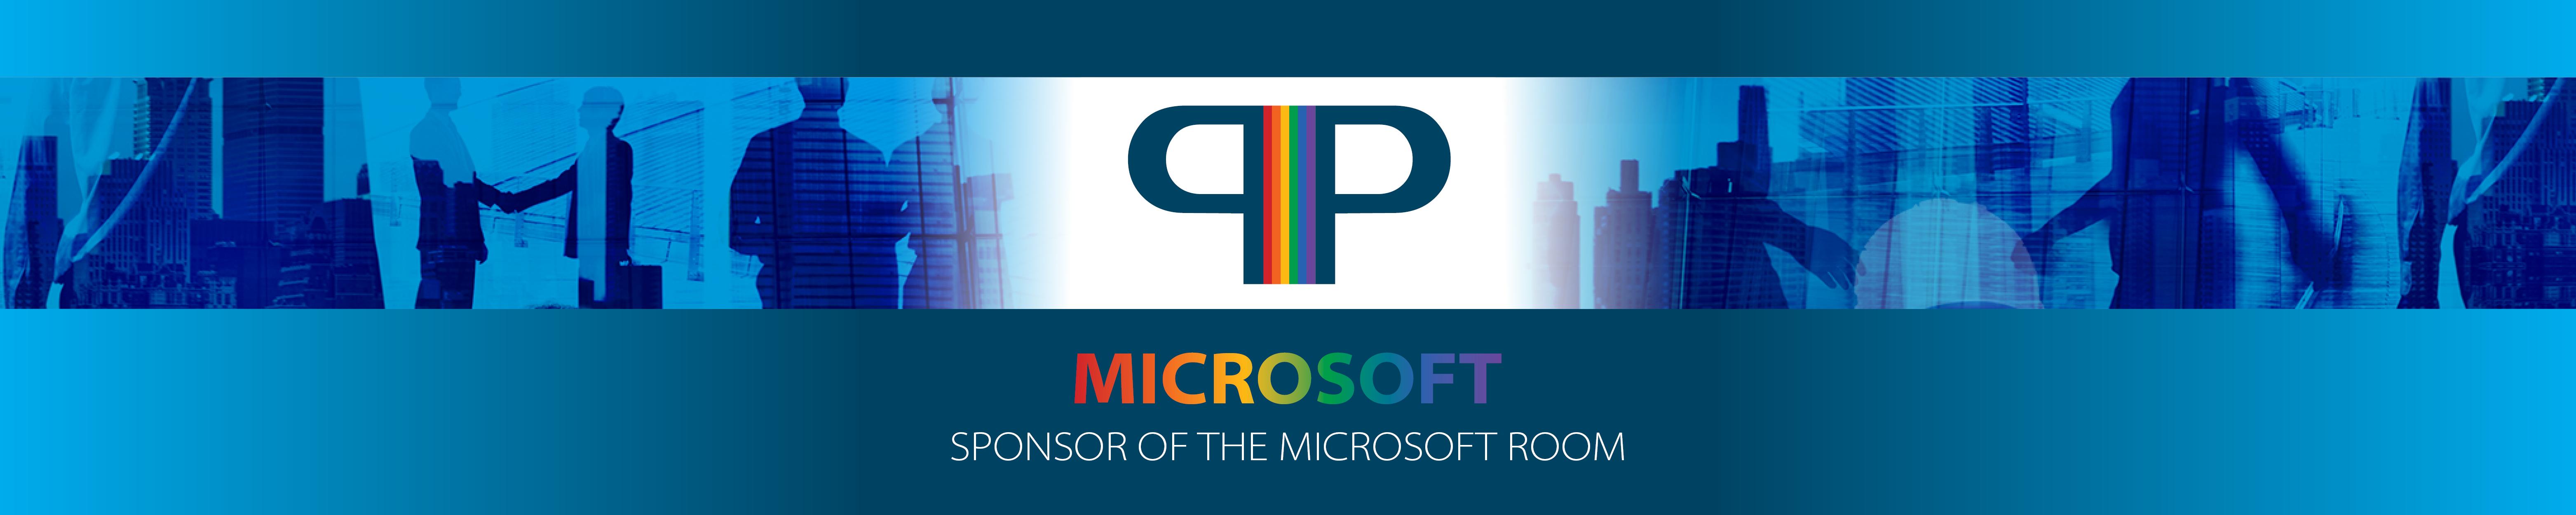 PIP_Conference_Microsoft_RoomSponsor2